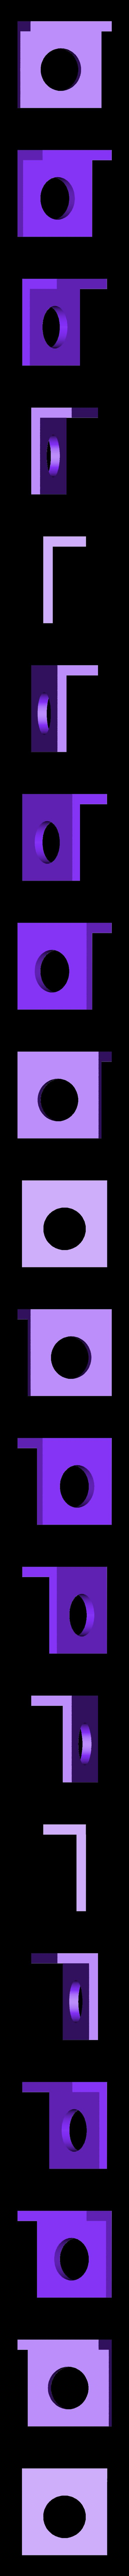 led mount top left-right.stl Download free STL file 3D Printer led light • 3D print model, DB46